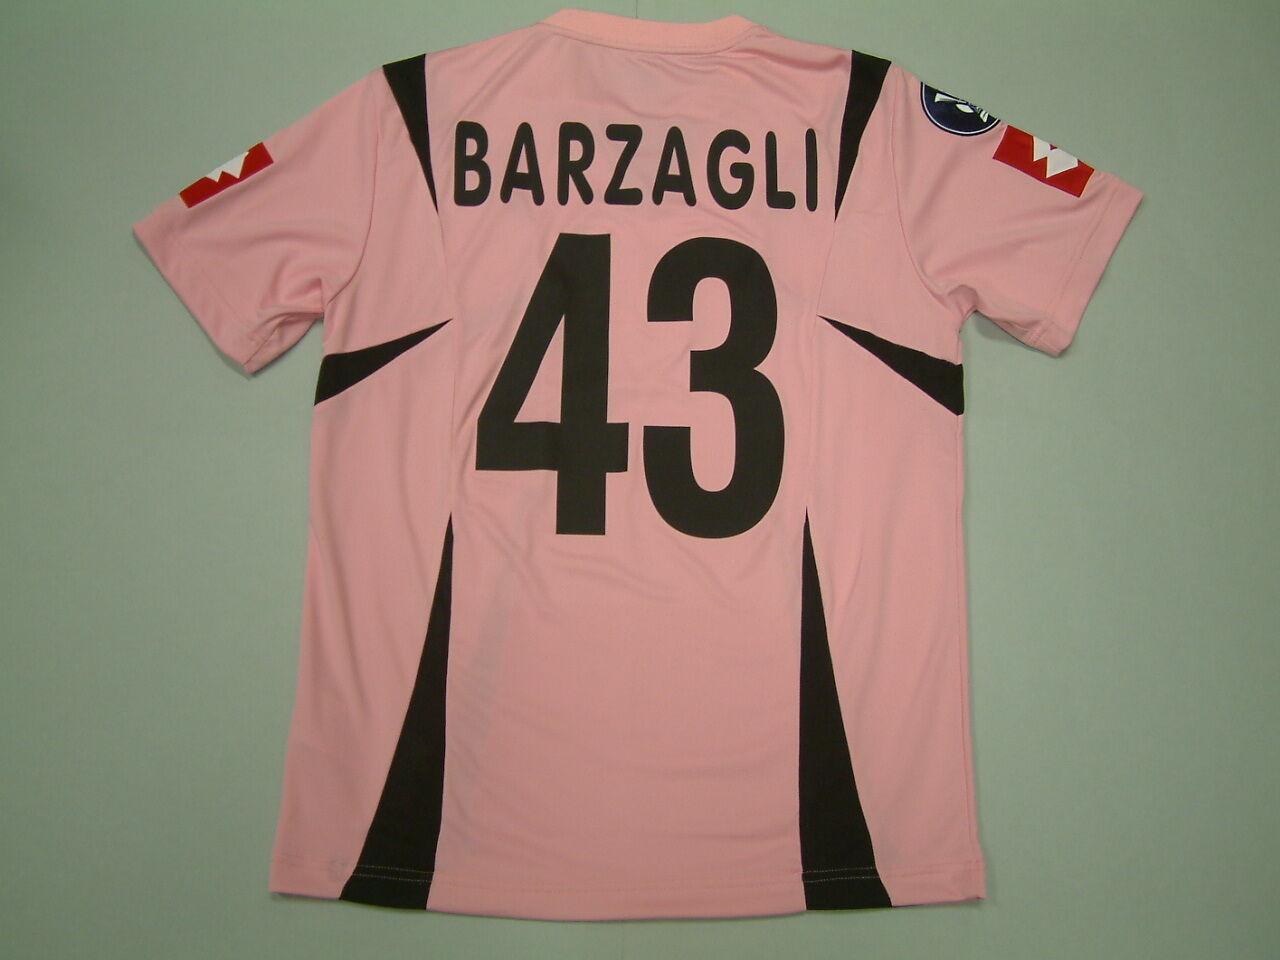 Barzagli Palermo Home match emitido mc-ss 2006-2007 Copa UEFA